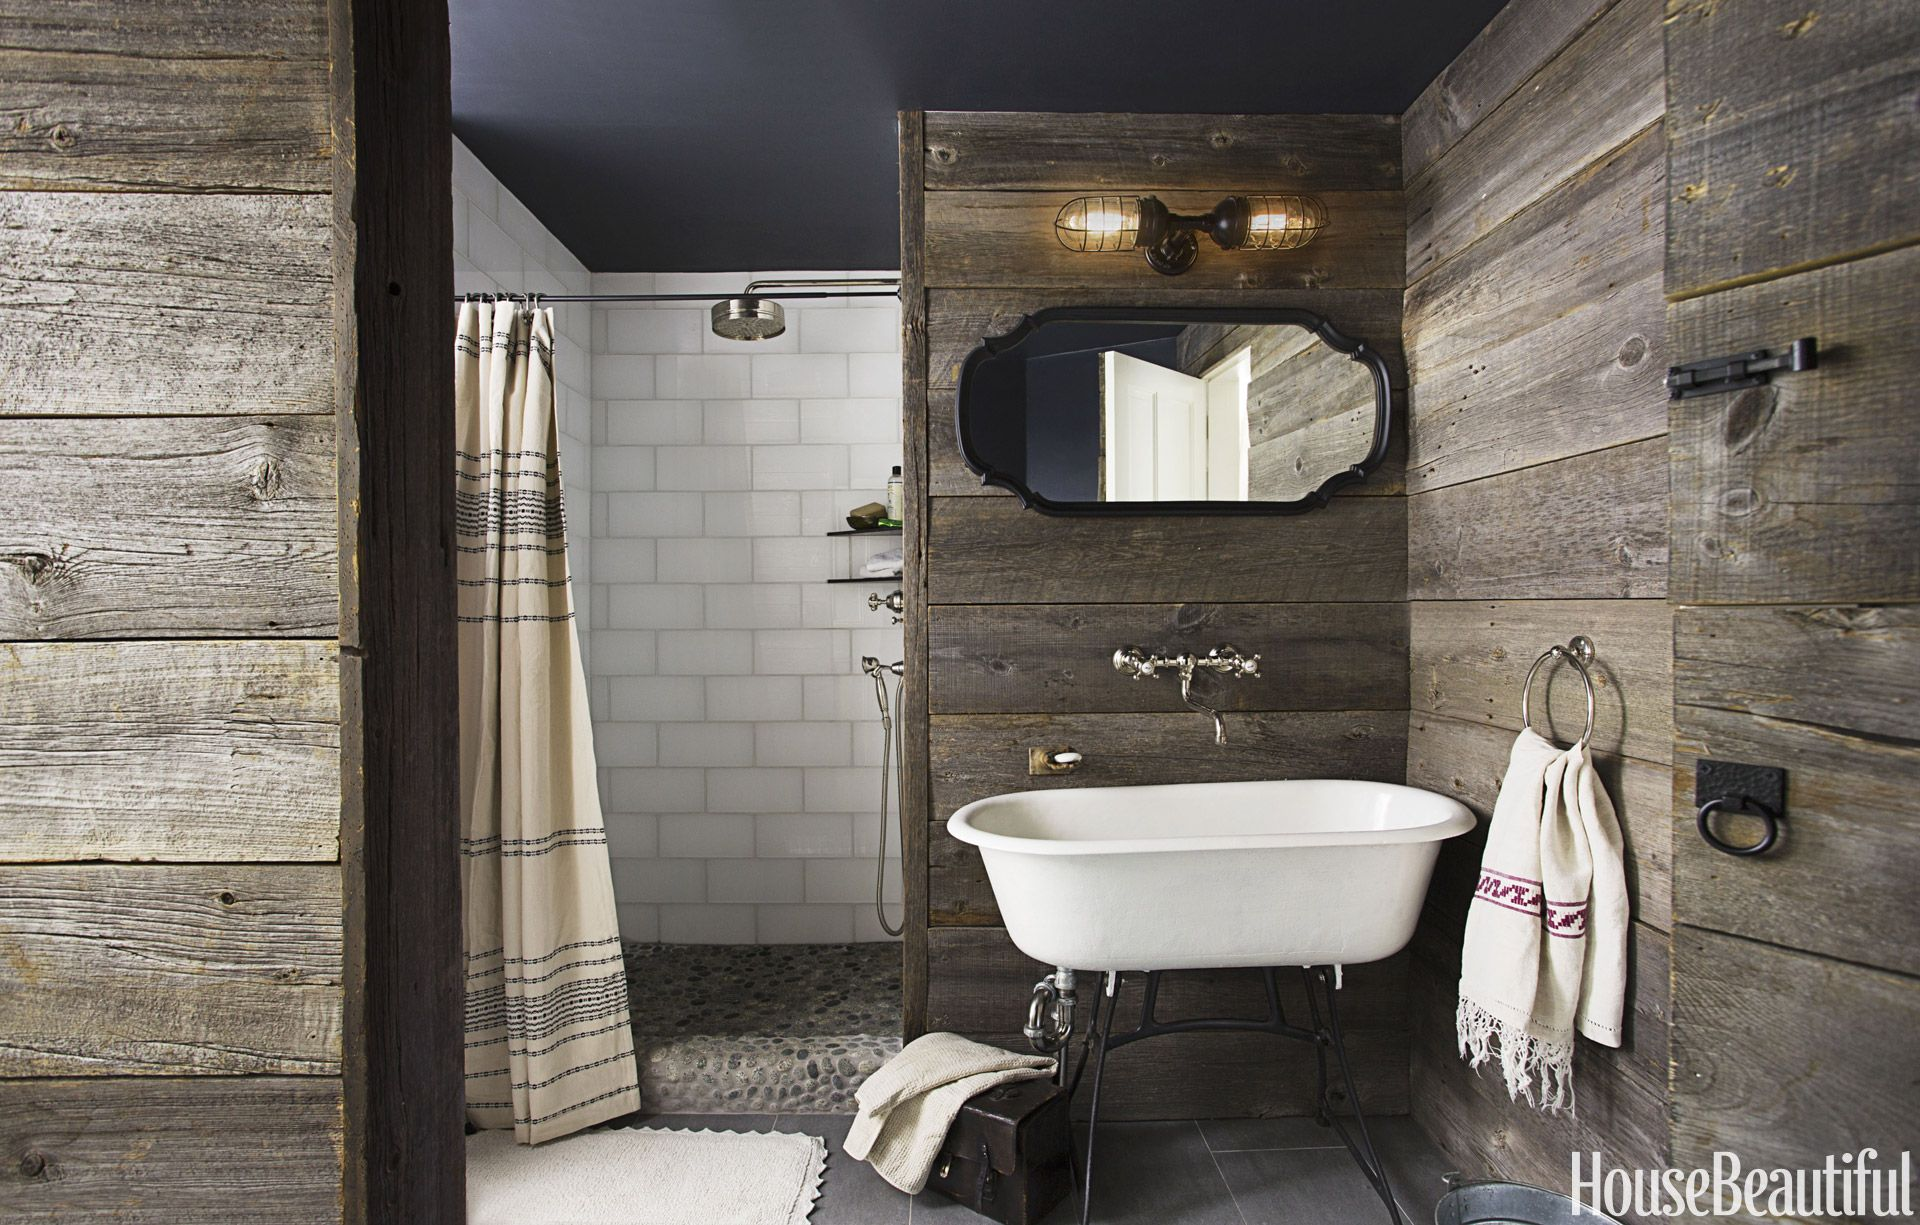 Modern Restrooms 140 Best Bathroom Design Ideas  Decor Pictures Of Stylish Modern